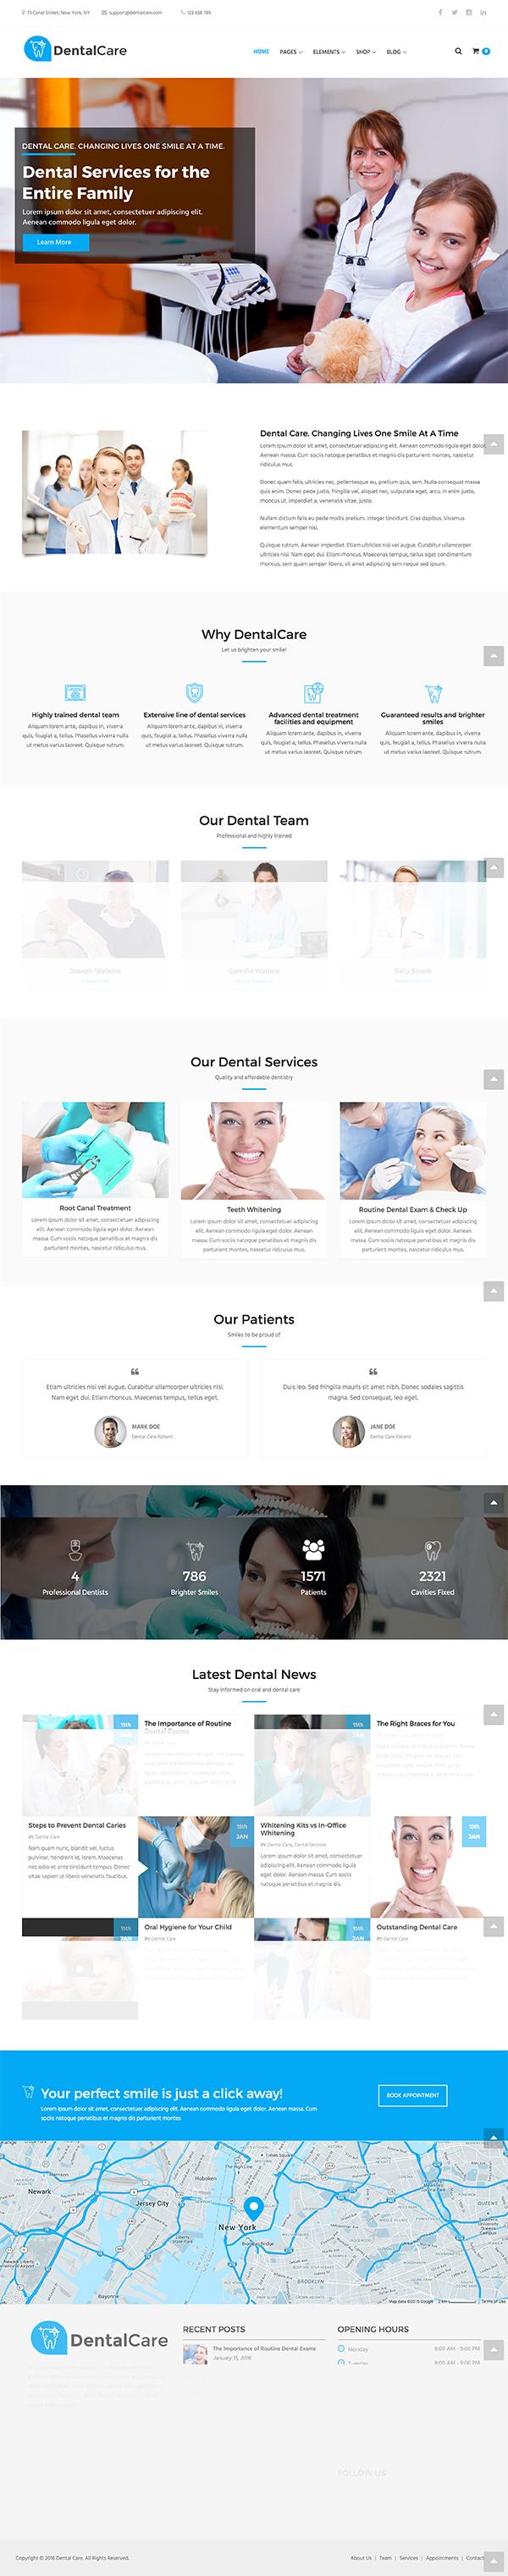 12 Dental Care - Dental & Medical WordPress Theme